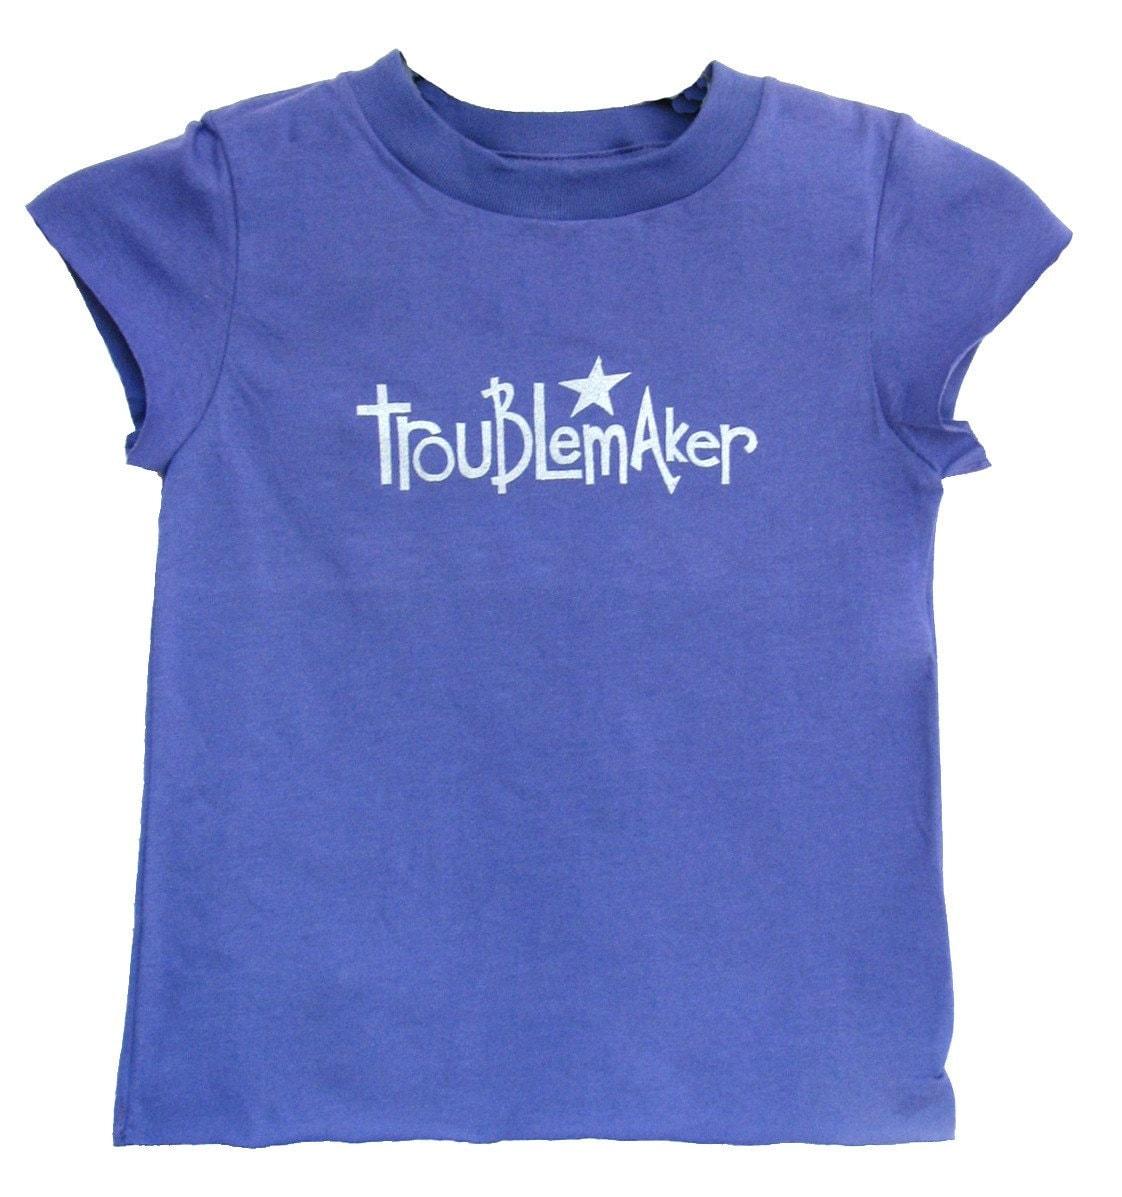 Trouble Maker Star Shirt (Child 2, 4, 6)